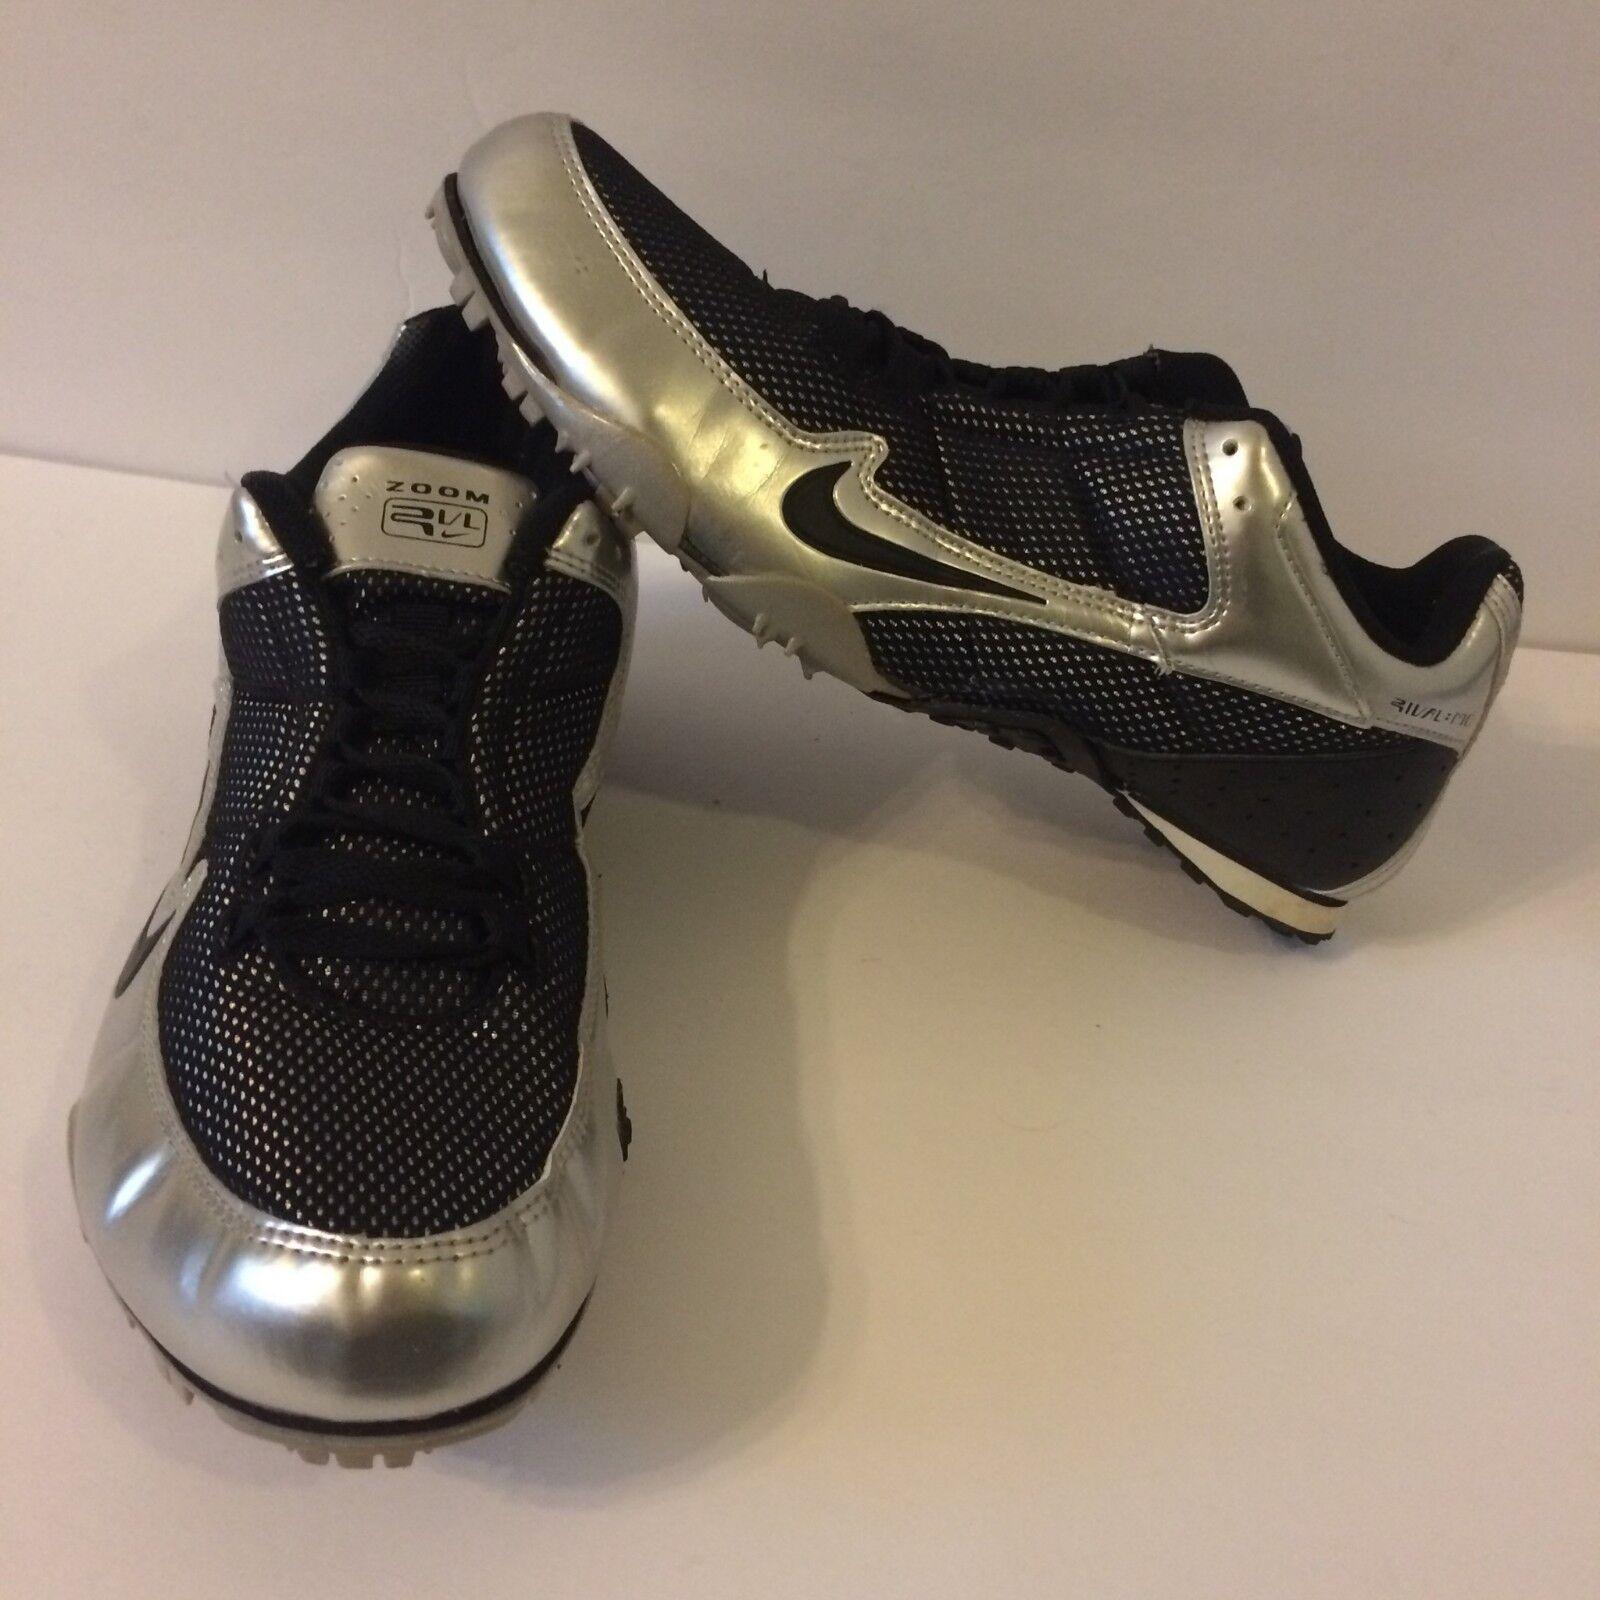 nike zoom rival   athletic athletic  piste Argent  Noir  bowerman chaussures chaussures taille 11 37b6de